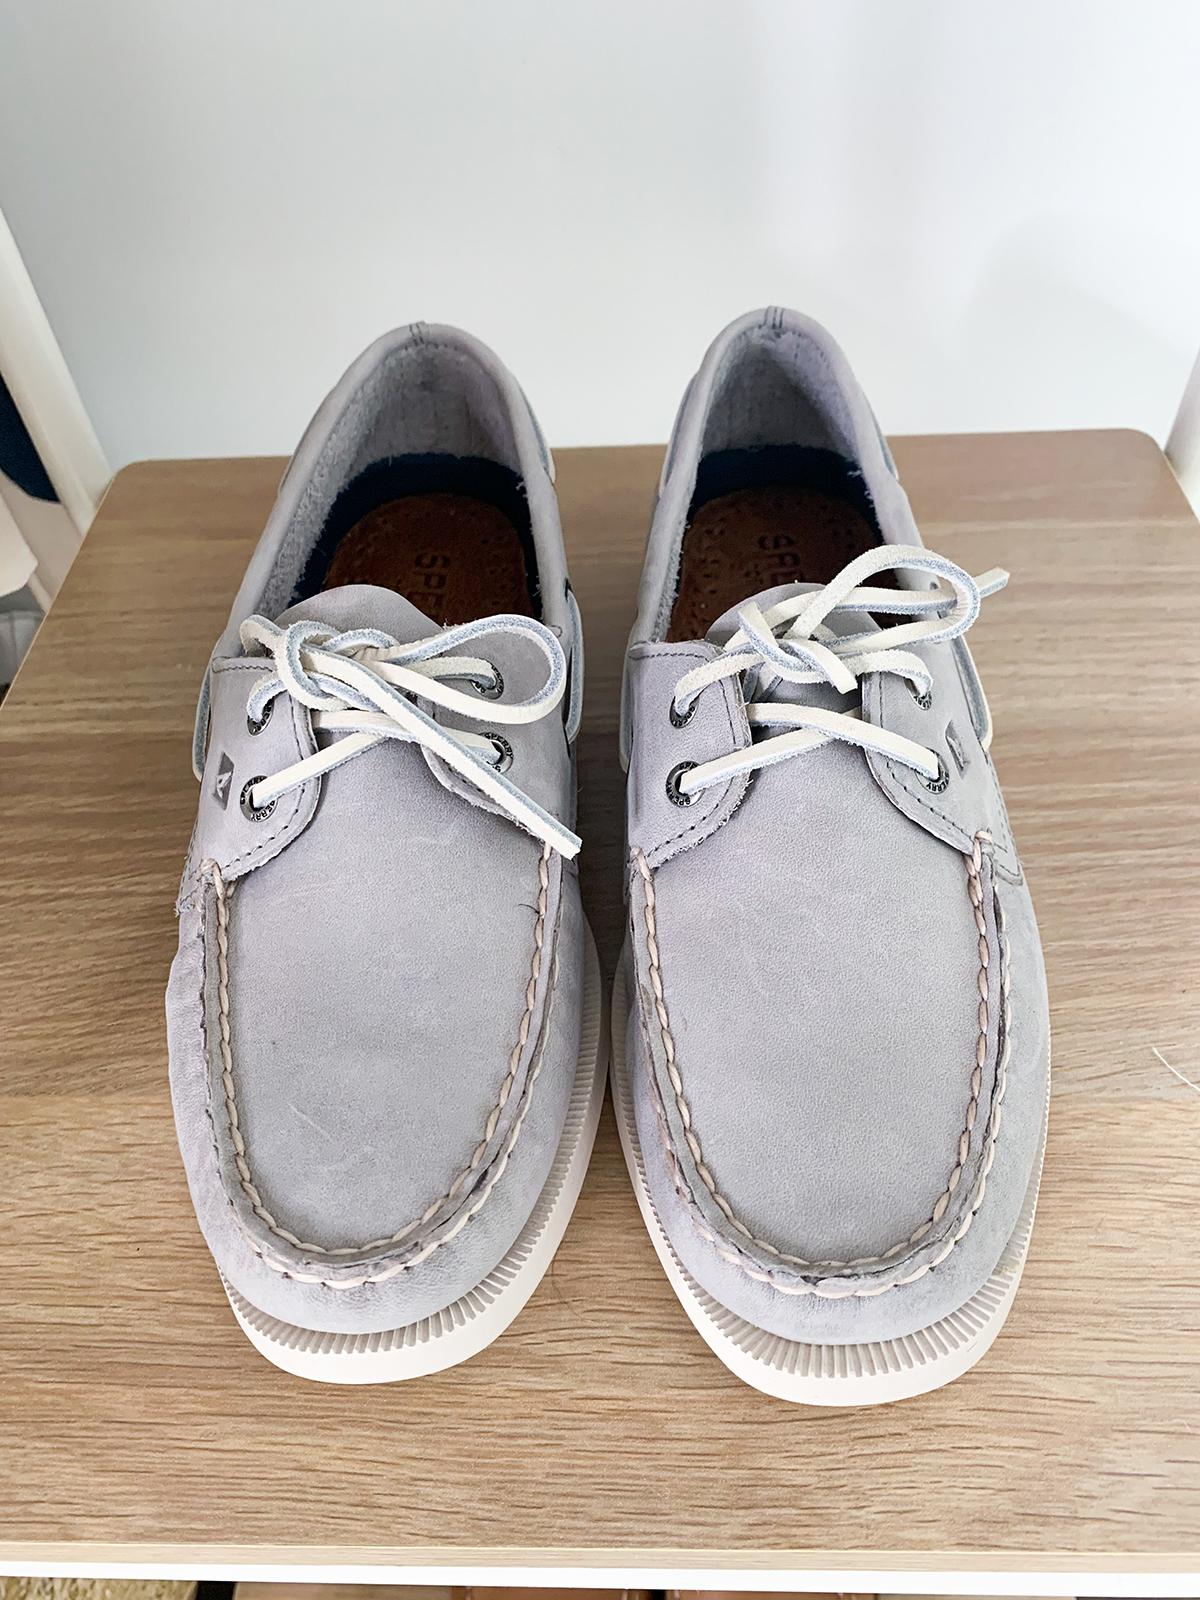 Sperry Women's Authentic Original Boat Shoe Gray